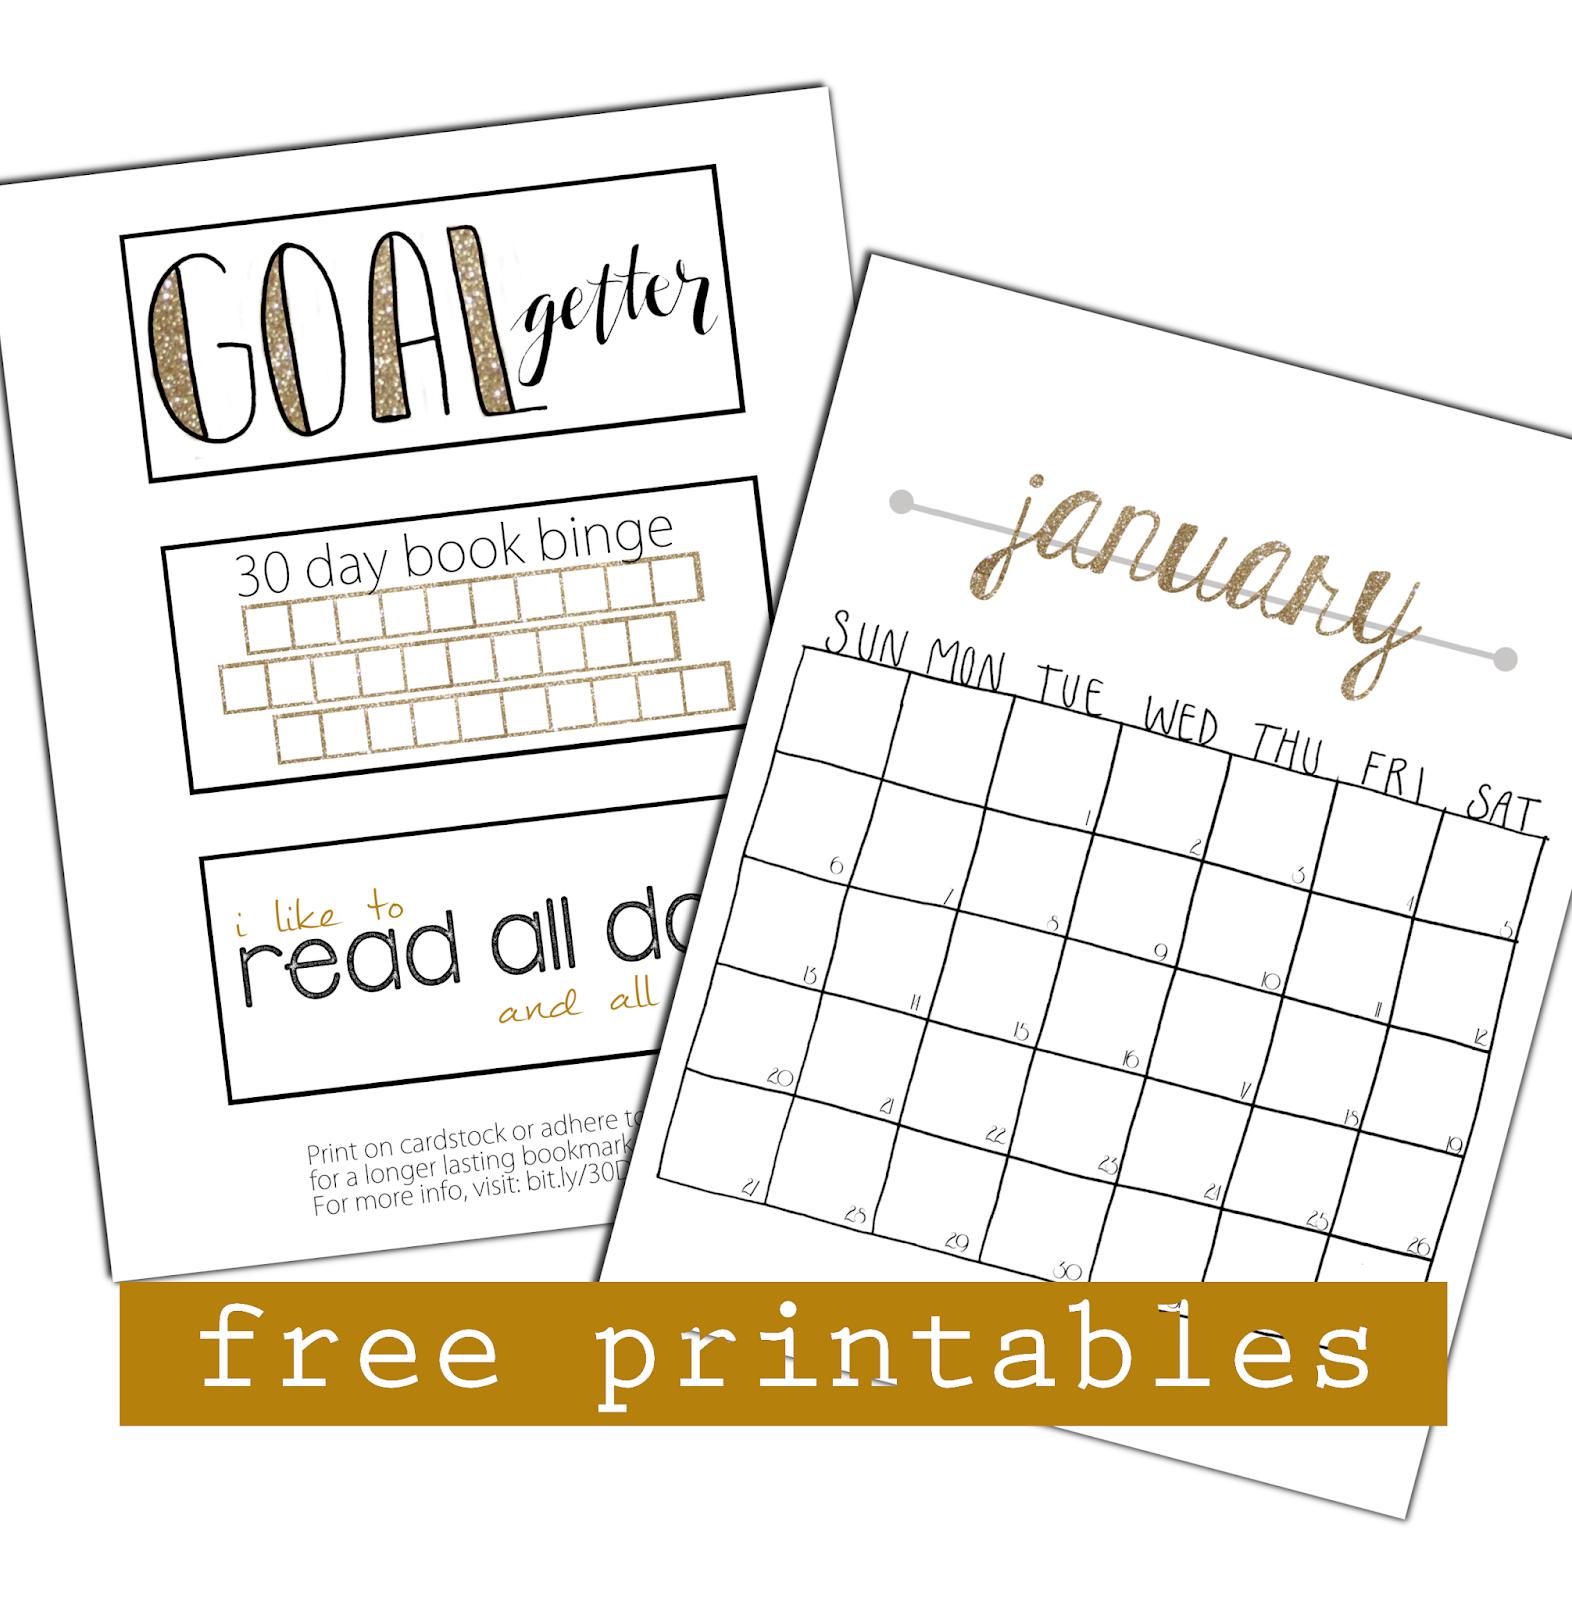 - The Book Rat: 30 Day Book Binge (7) FREE PRINTABLES!